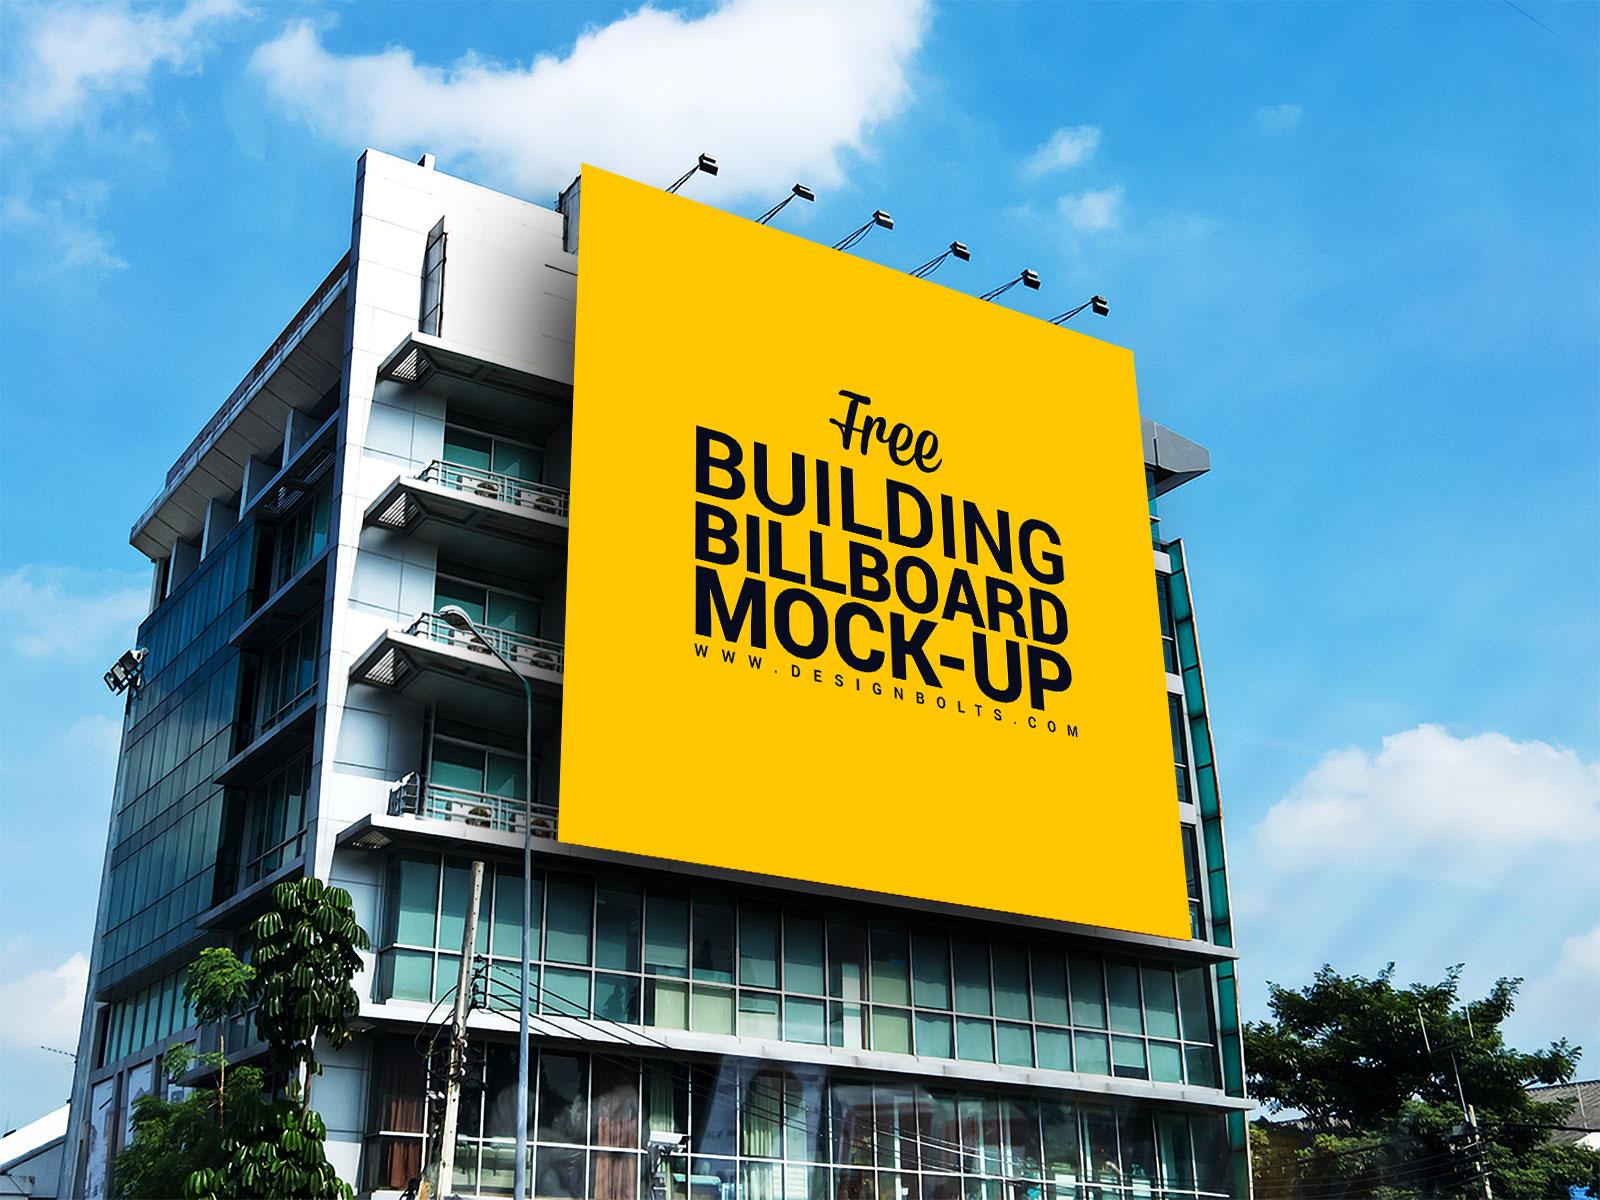 Free-Outdoor-Advertisement-Building-Billboard-Mockup-PSD